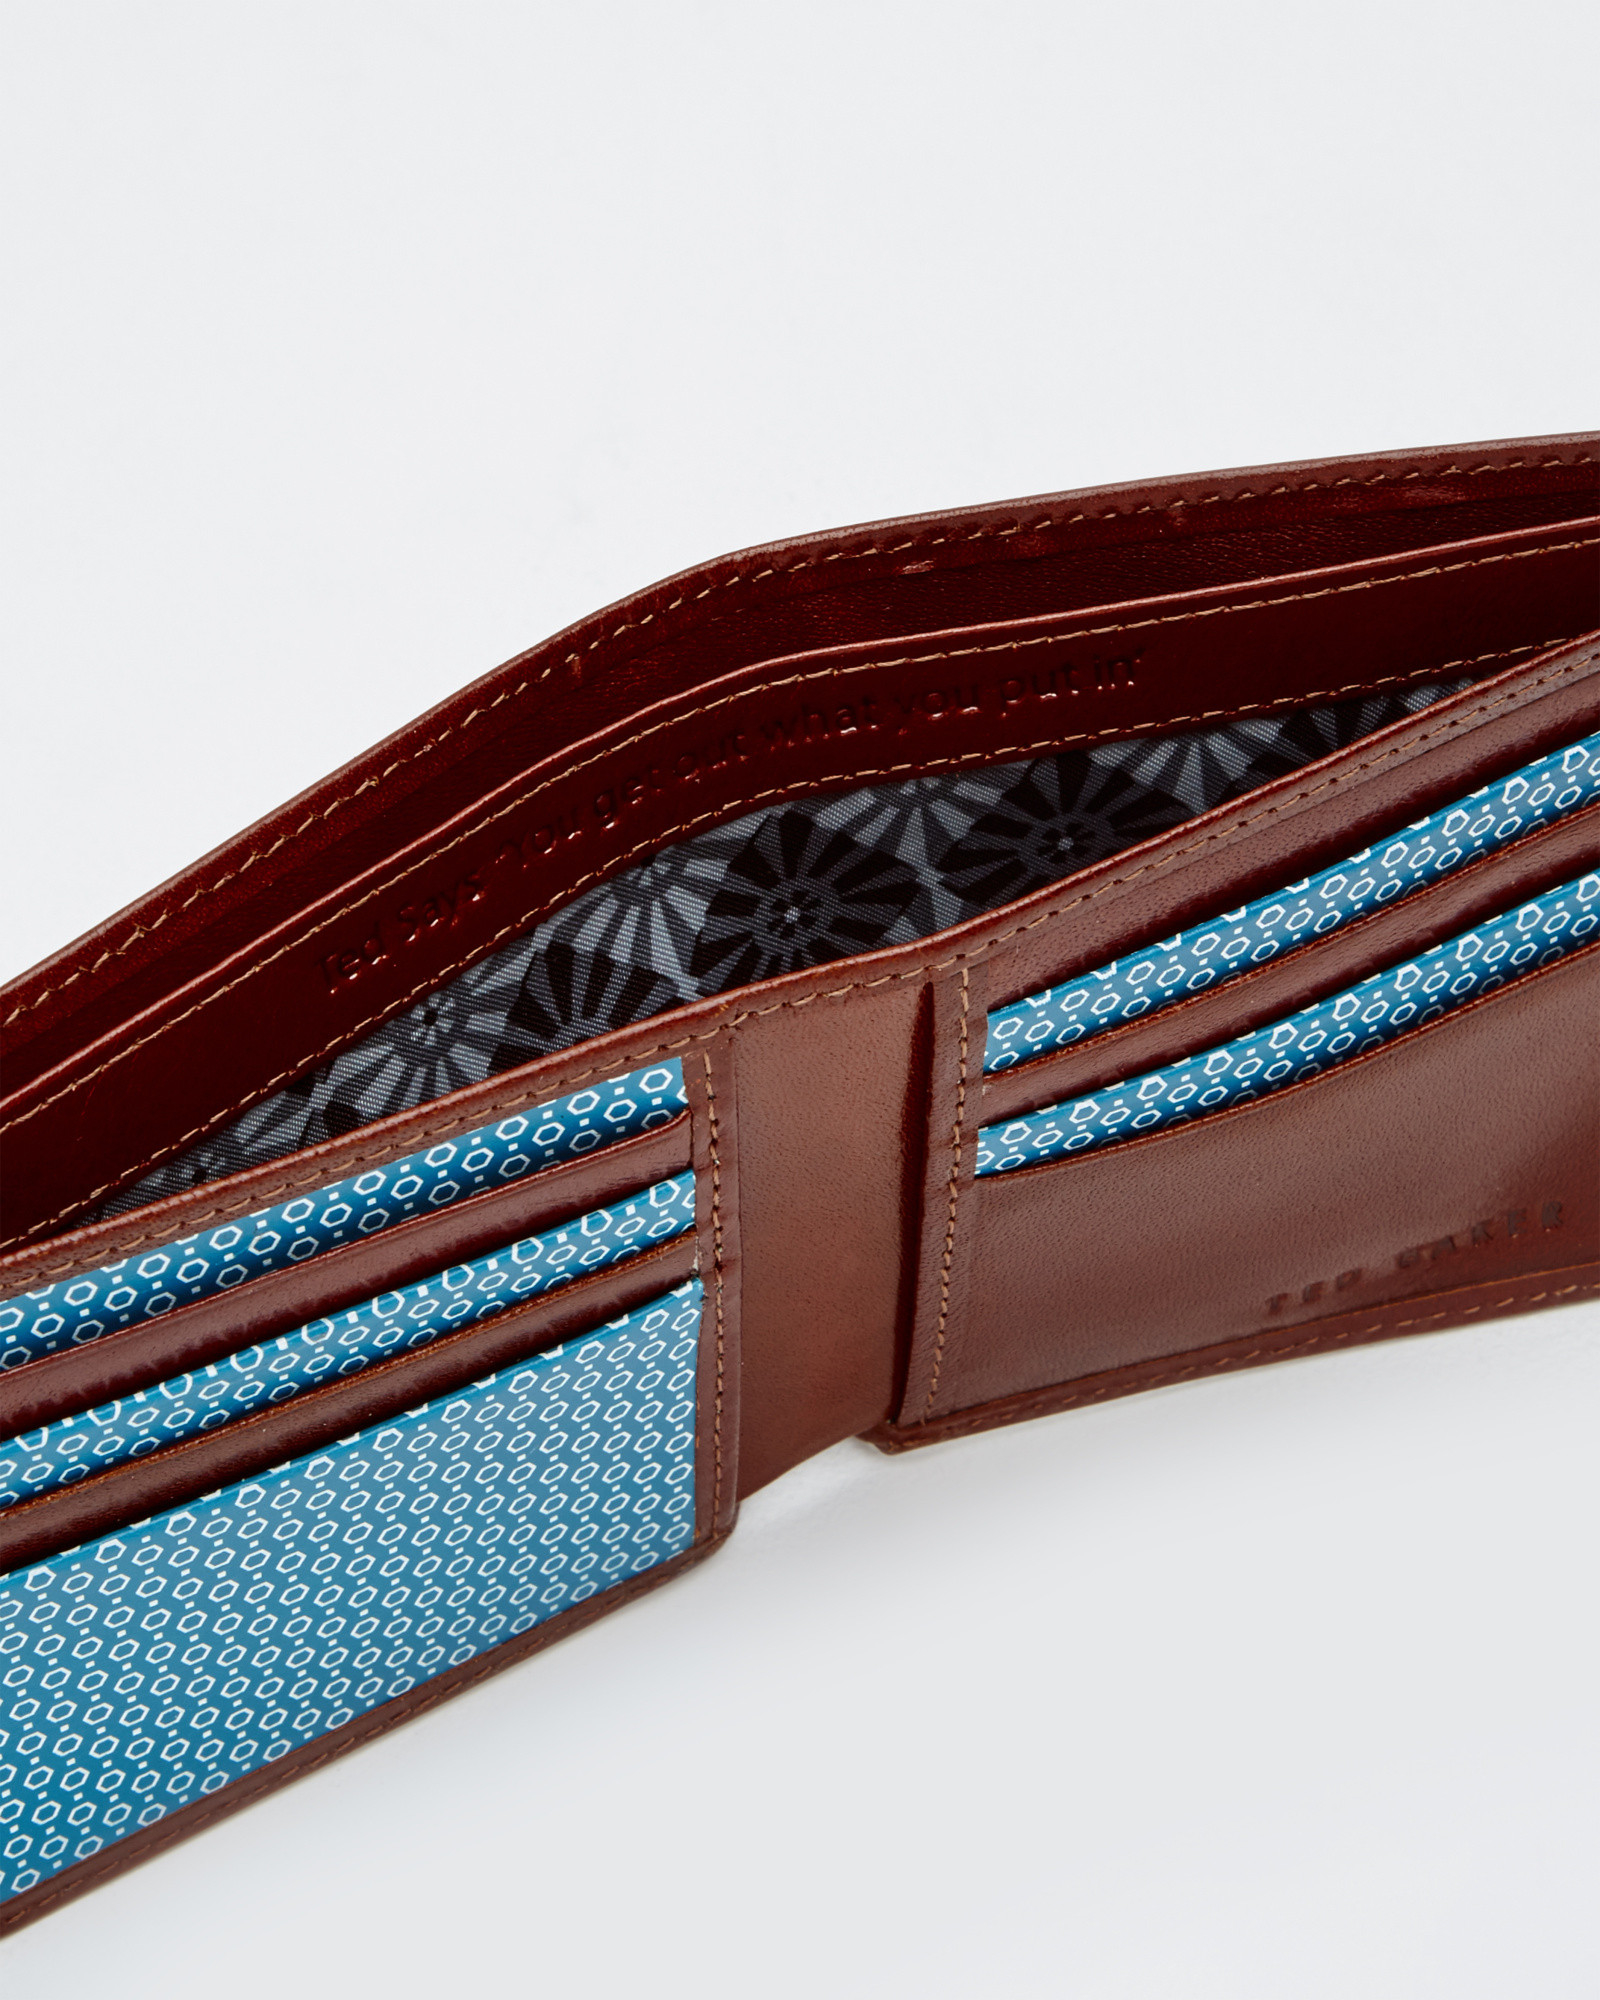 3b6f87213 Ted Baker Geo Print Leather Bi-fold Wallet in Brown for Men - Lyst